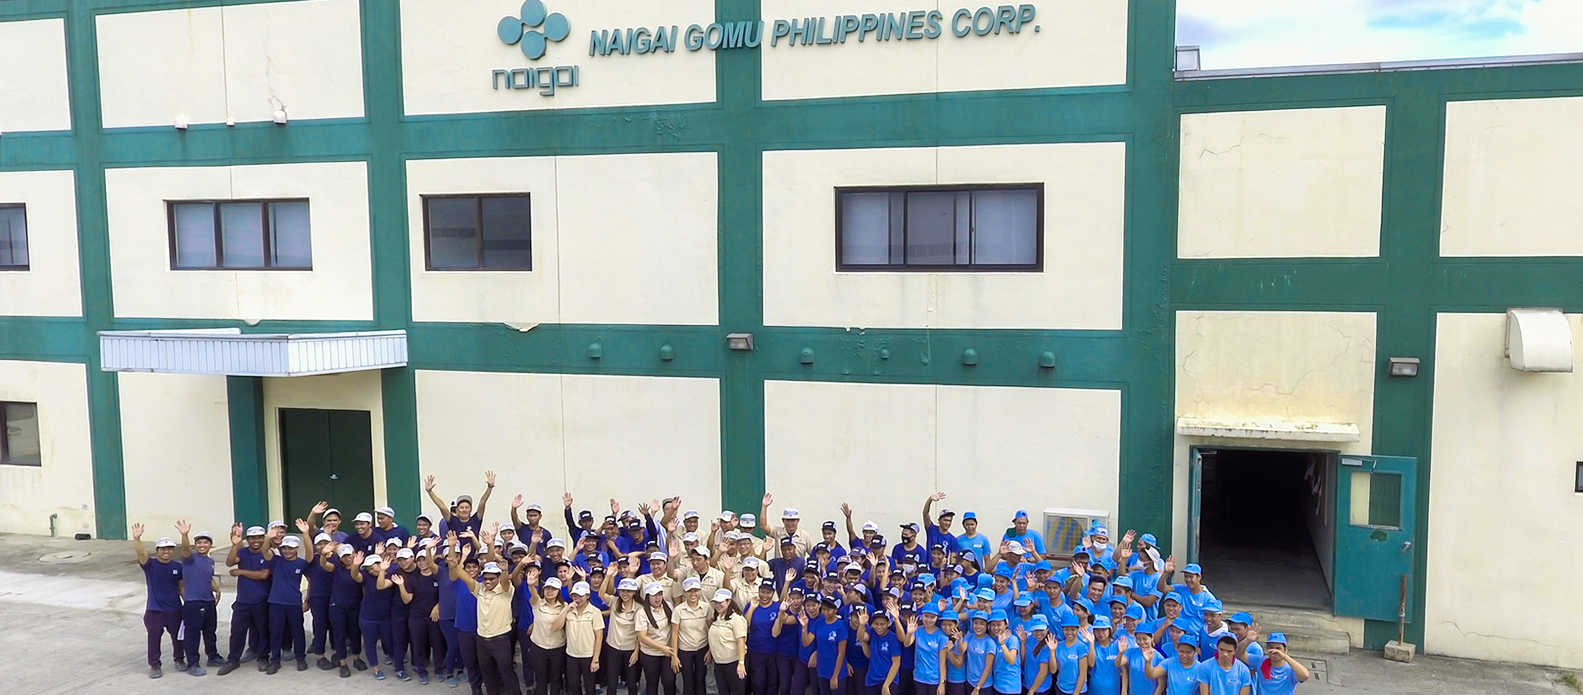 NAIGAI GOMU PHILIPPINES CORPORATION